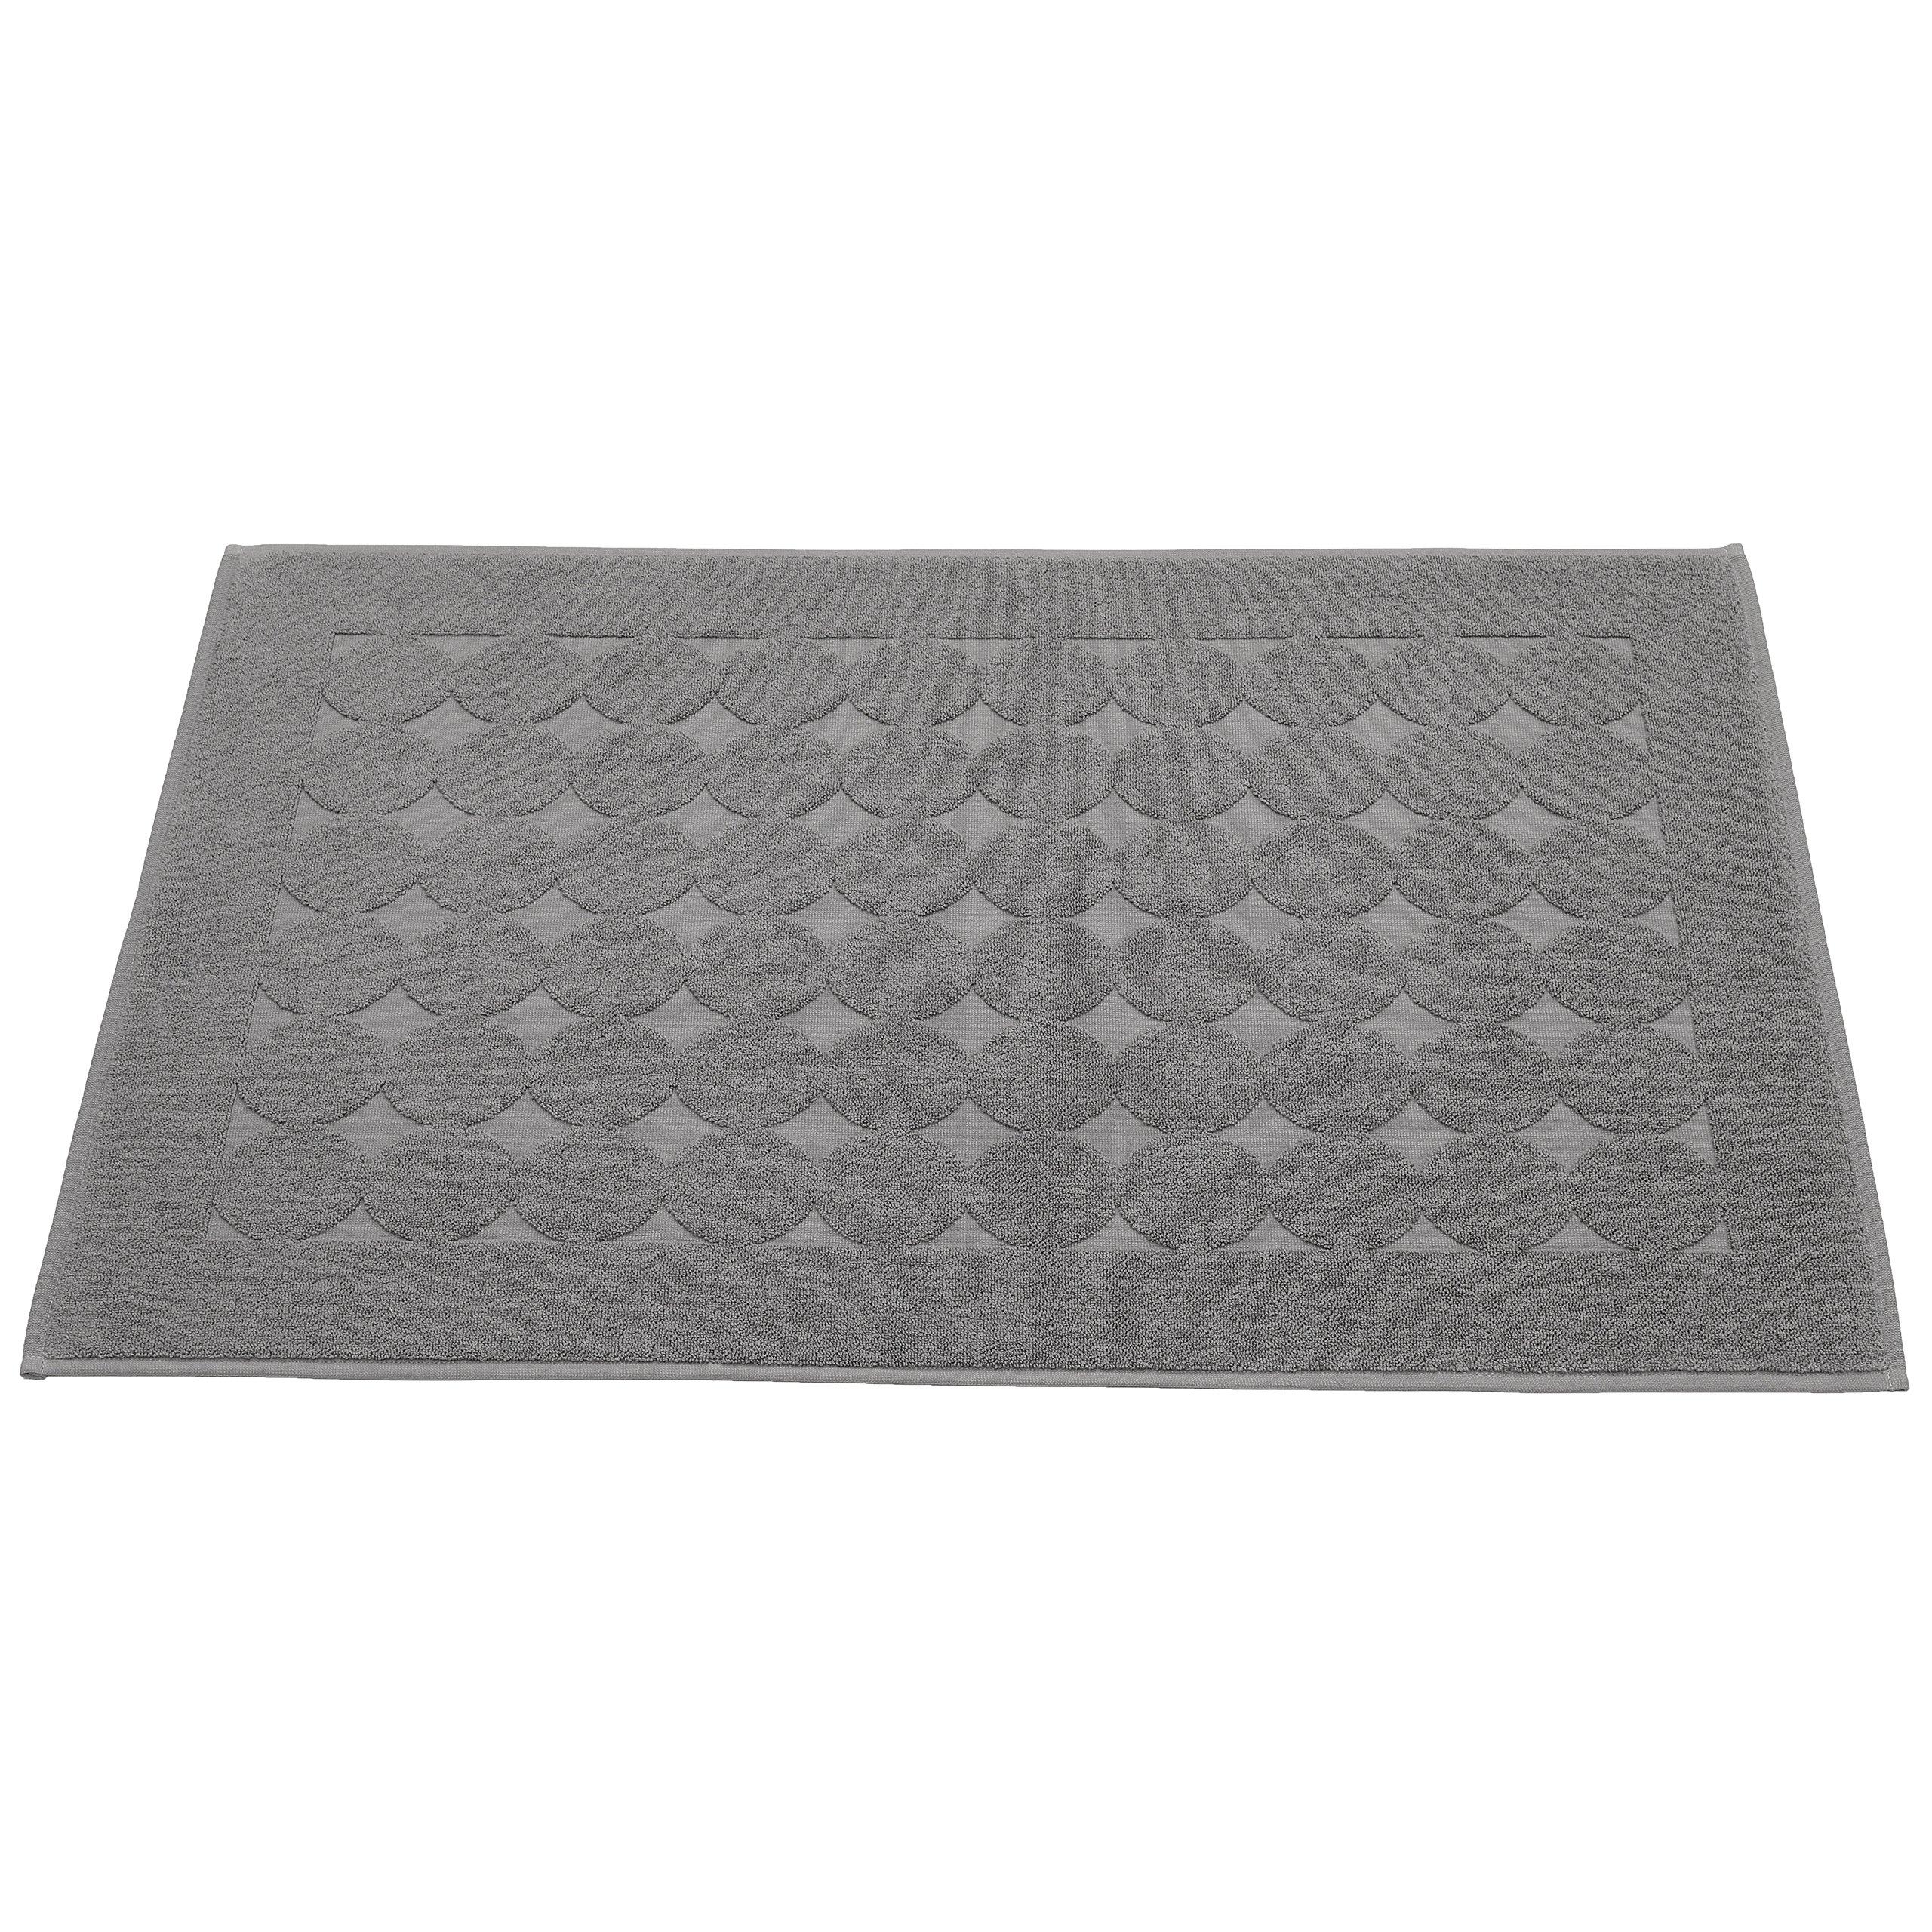 Linum Home Textiles SN96-1CD Bath Towel, Dark Grey